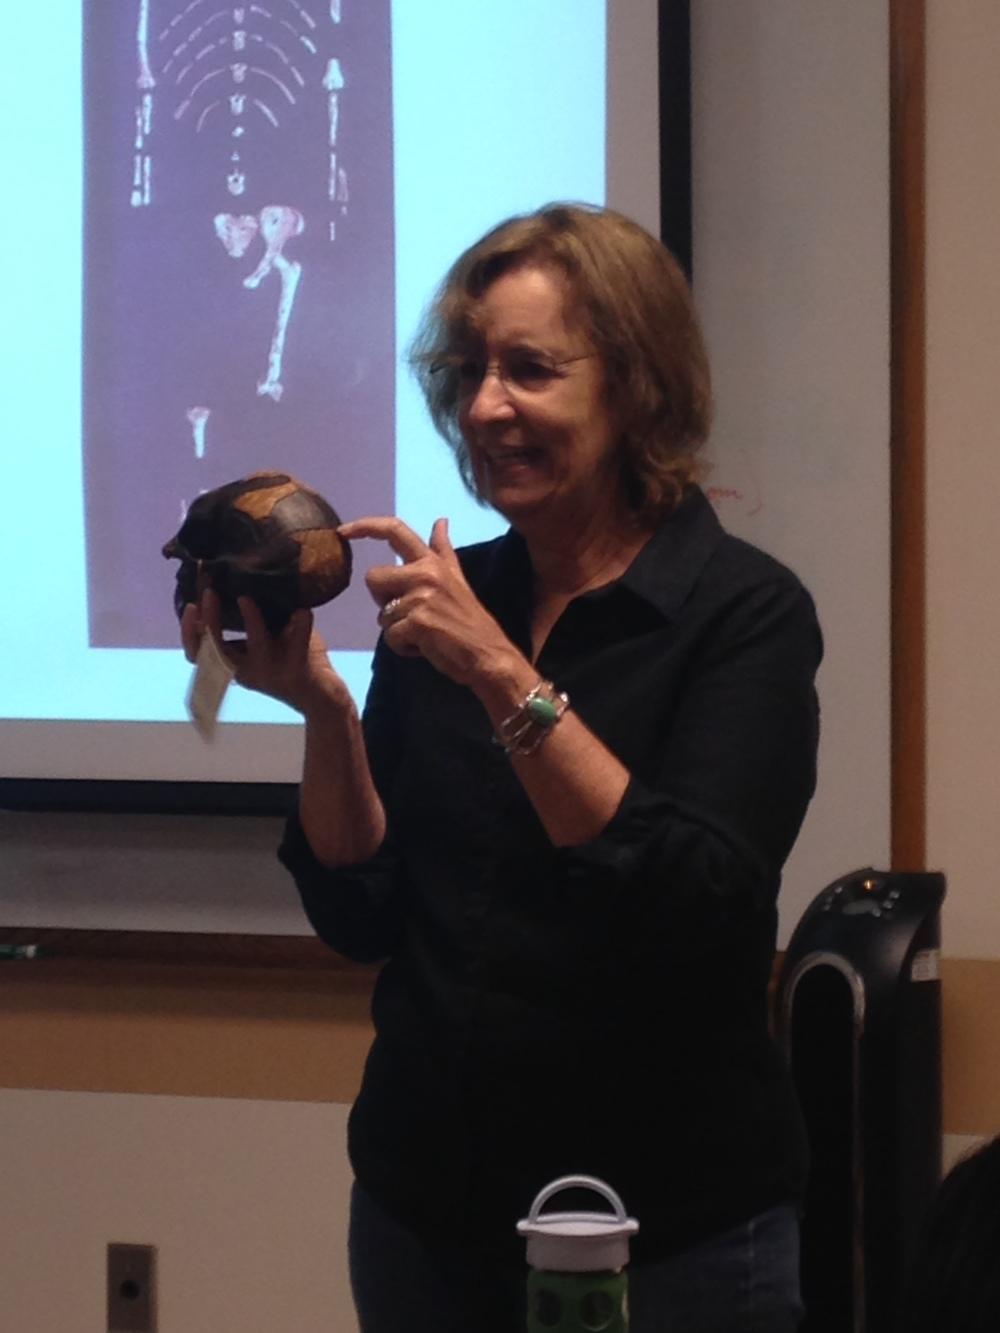 Dr. Carol Lauer